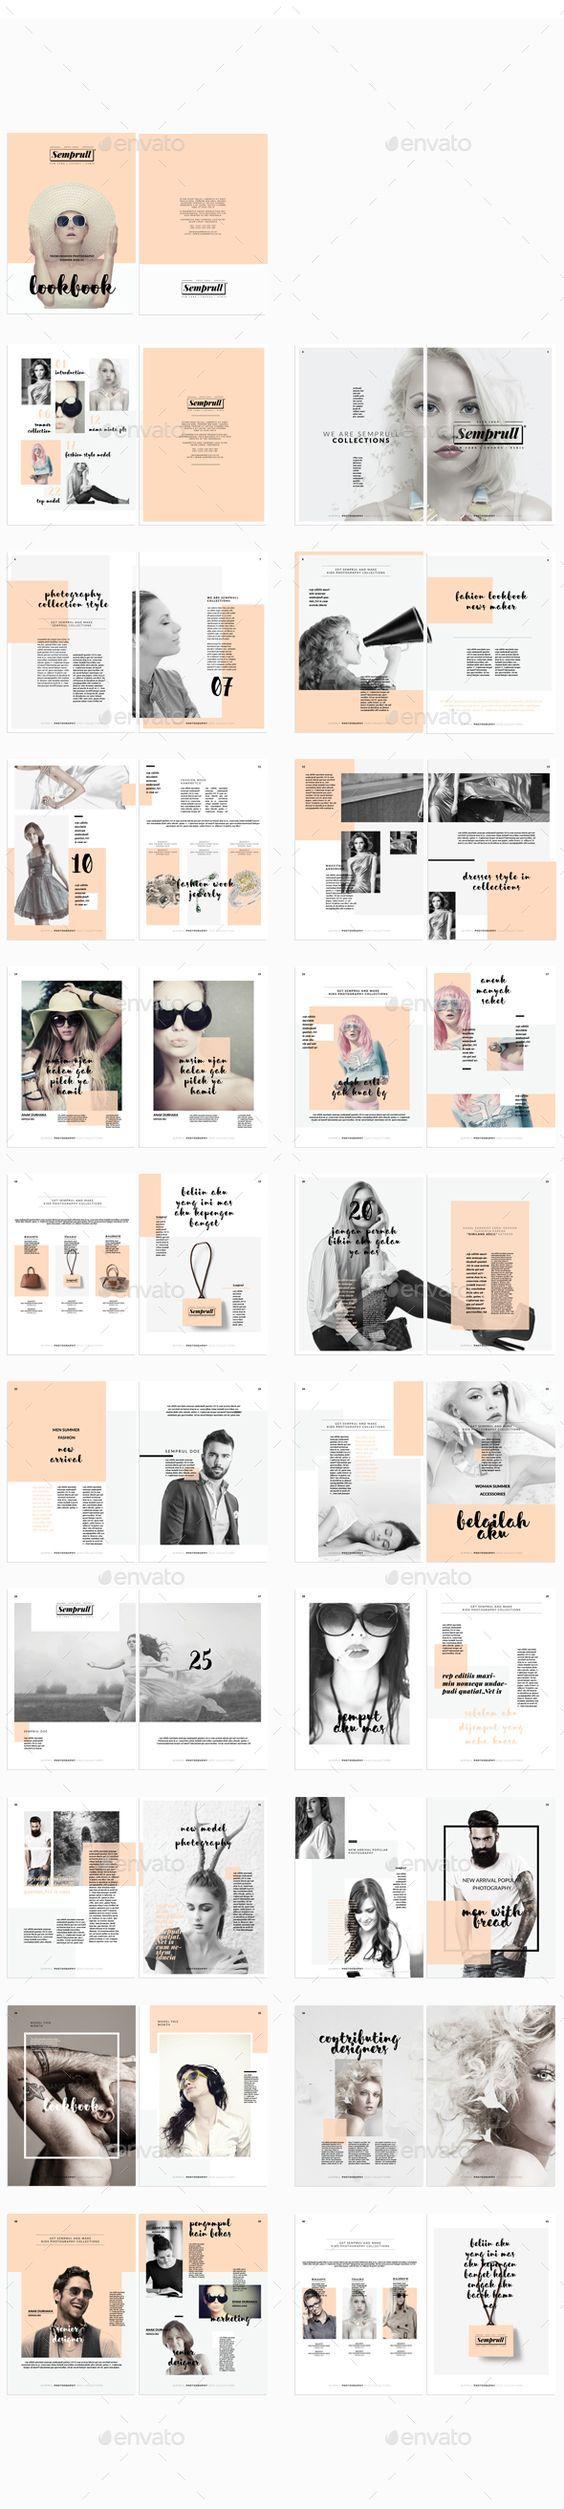 Lookbook Template InDesign INDD #design Download: http://graphicriver.net/item/lookbook/14095999?ref=ksioks: